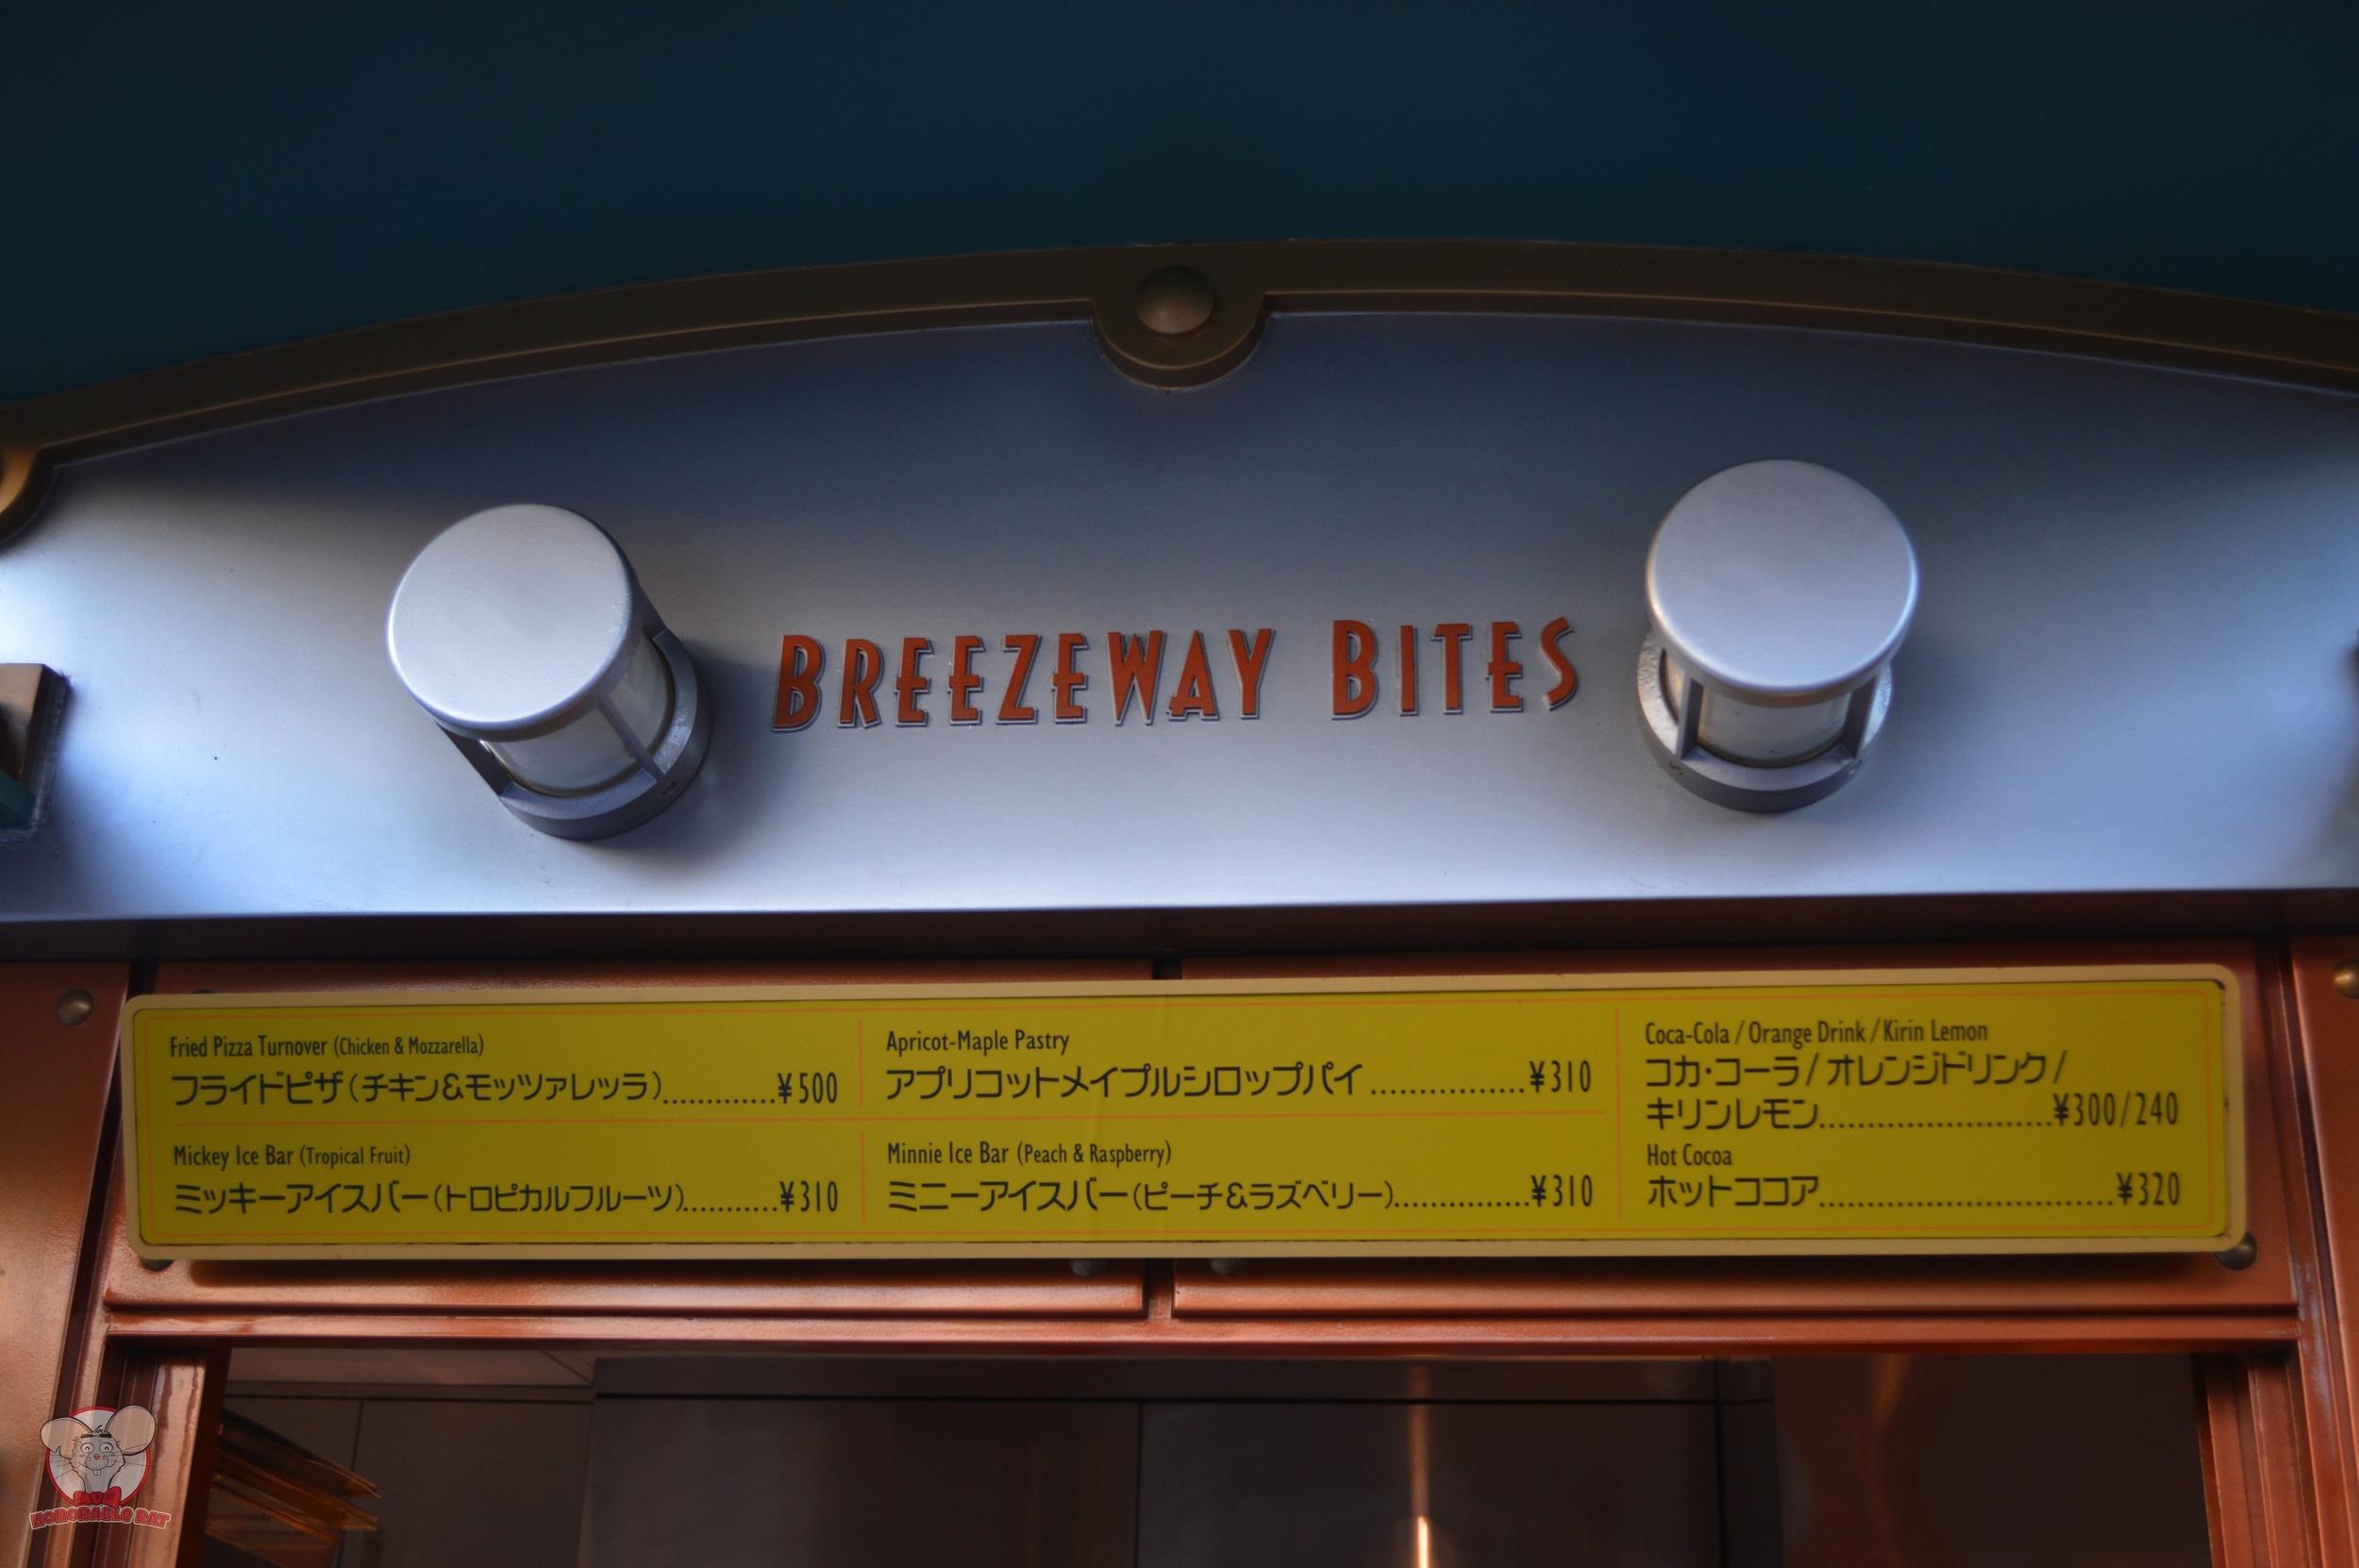 Breezeway Bites Signage